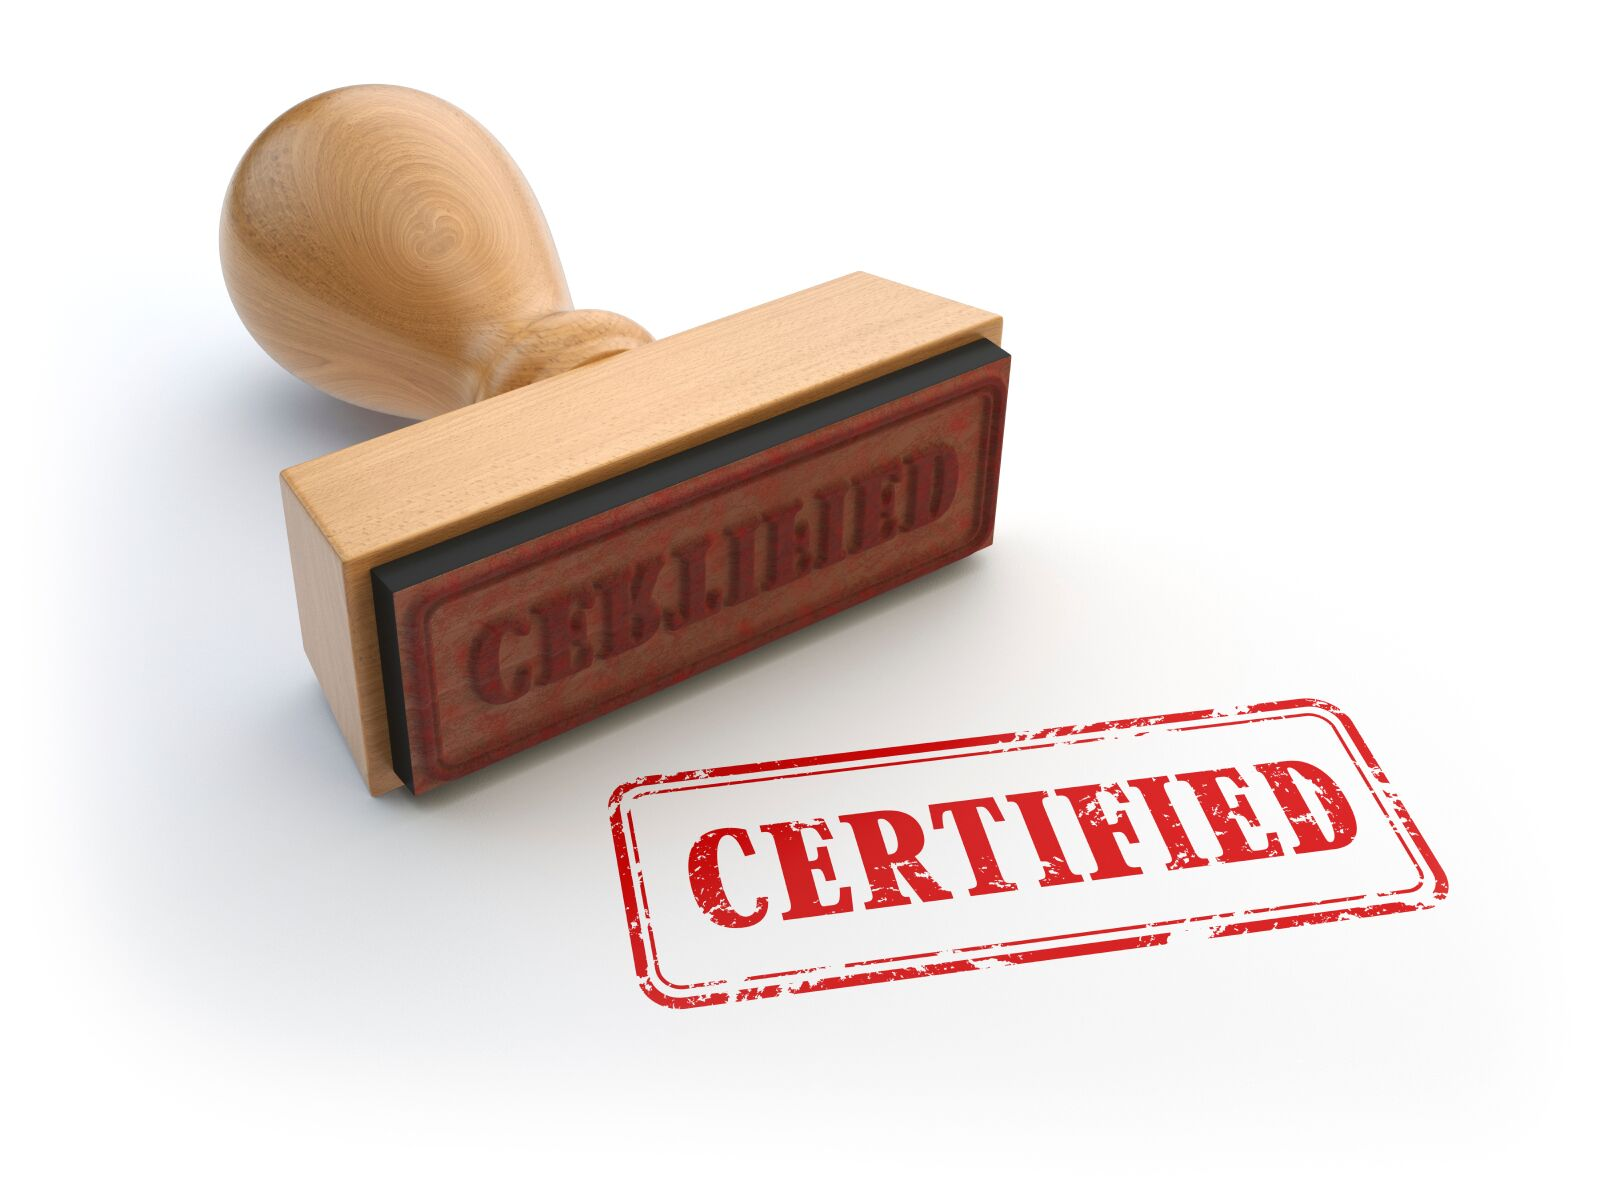 Certified_Stamp.jpeg